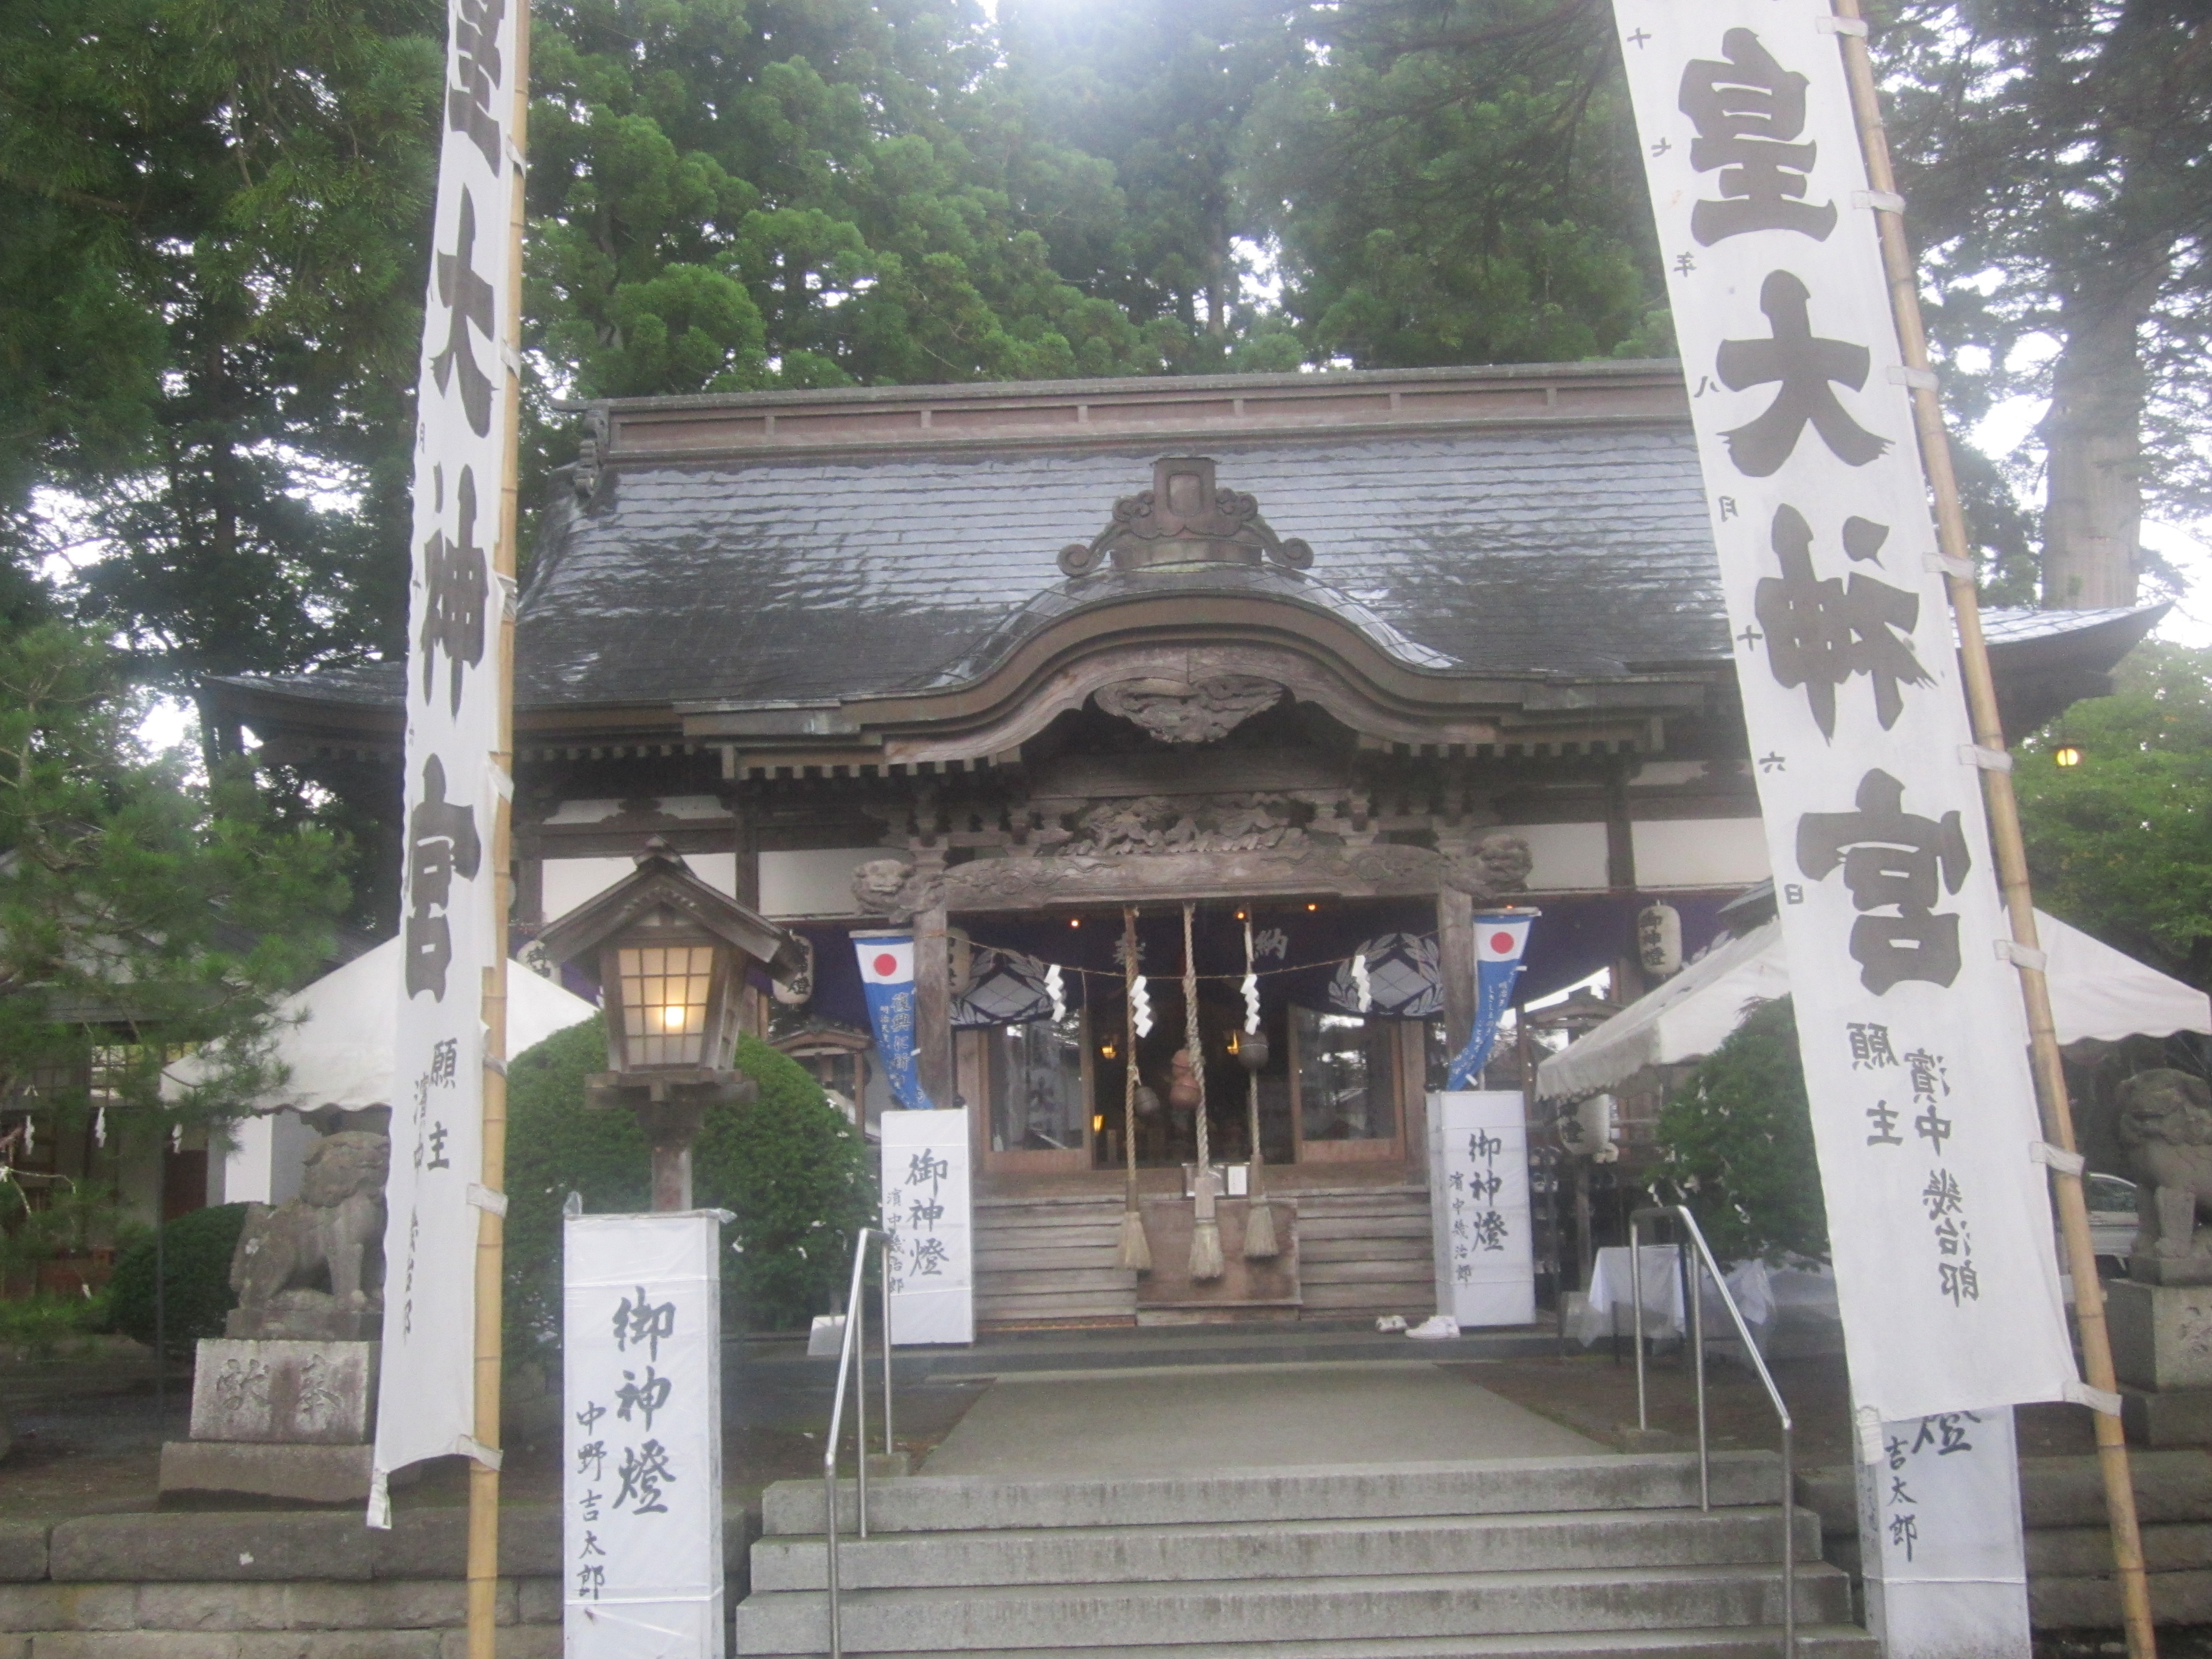 IMG 4230 - 麻布十番納涼祭り25,26日(七戸町出店)